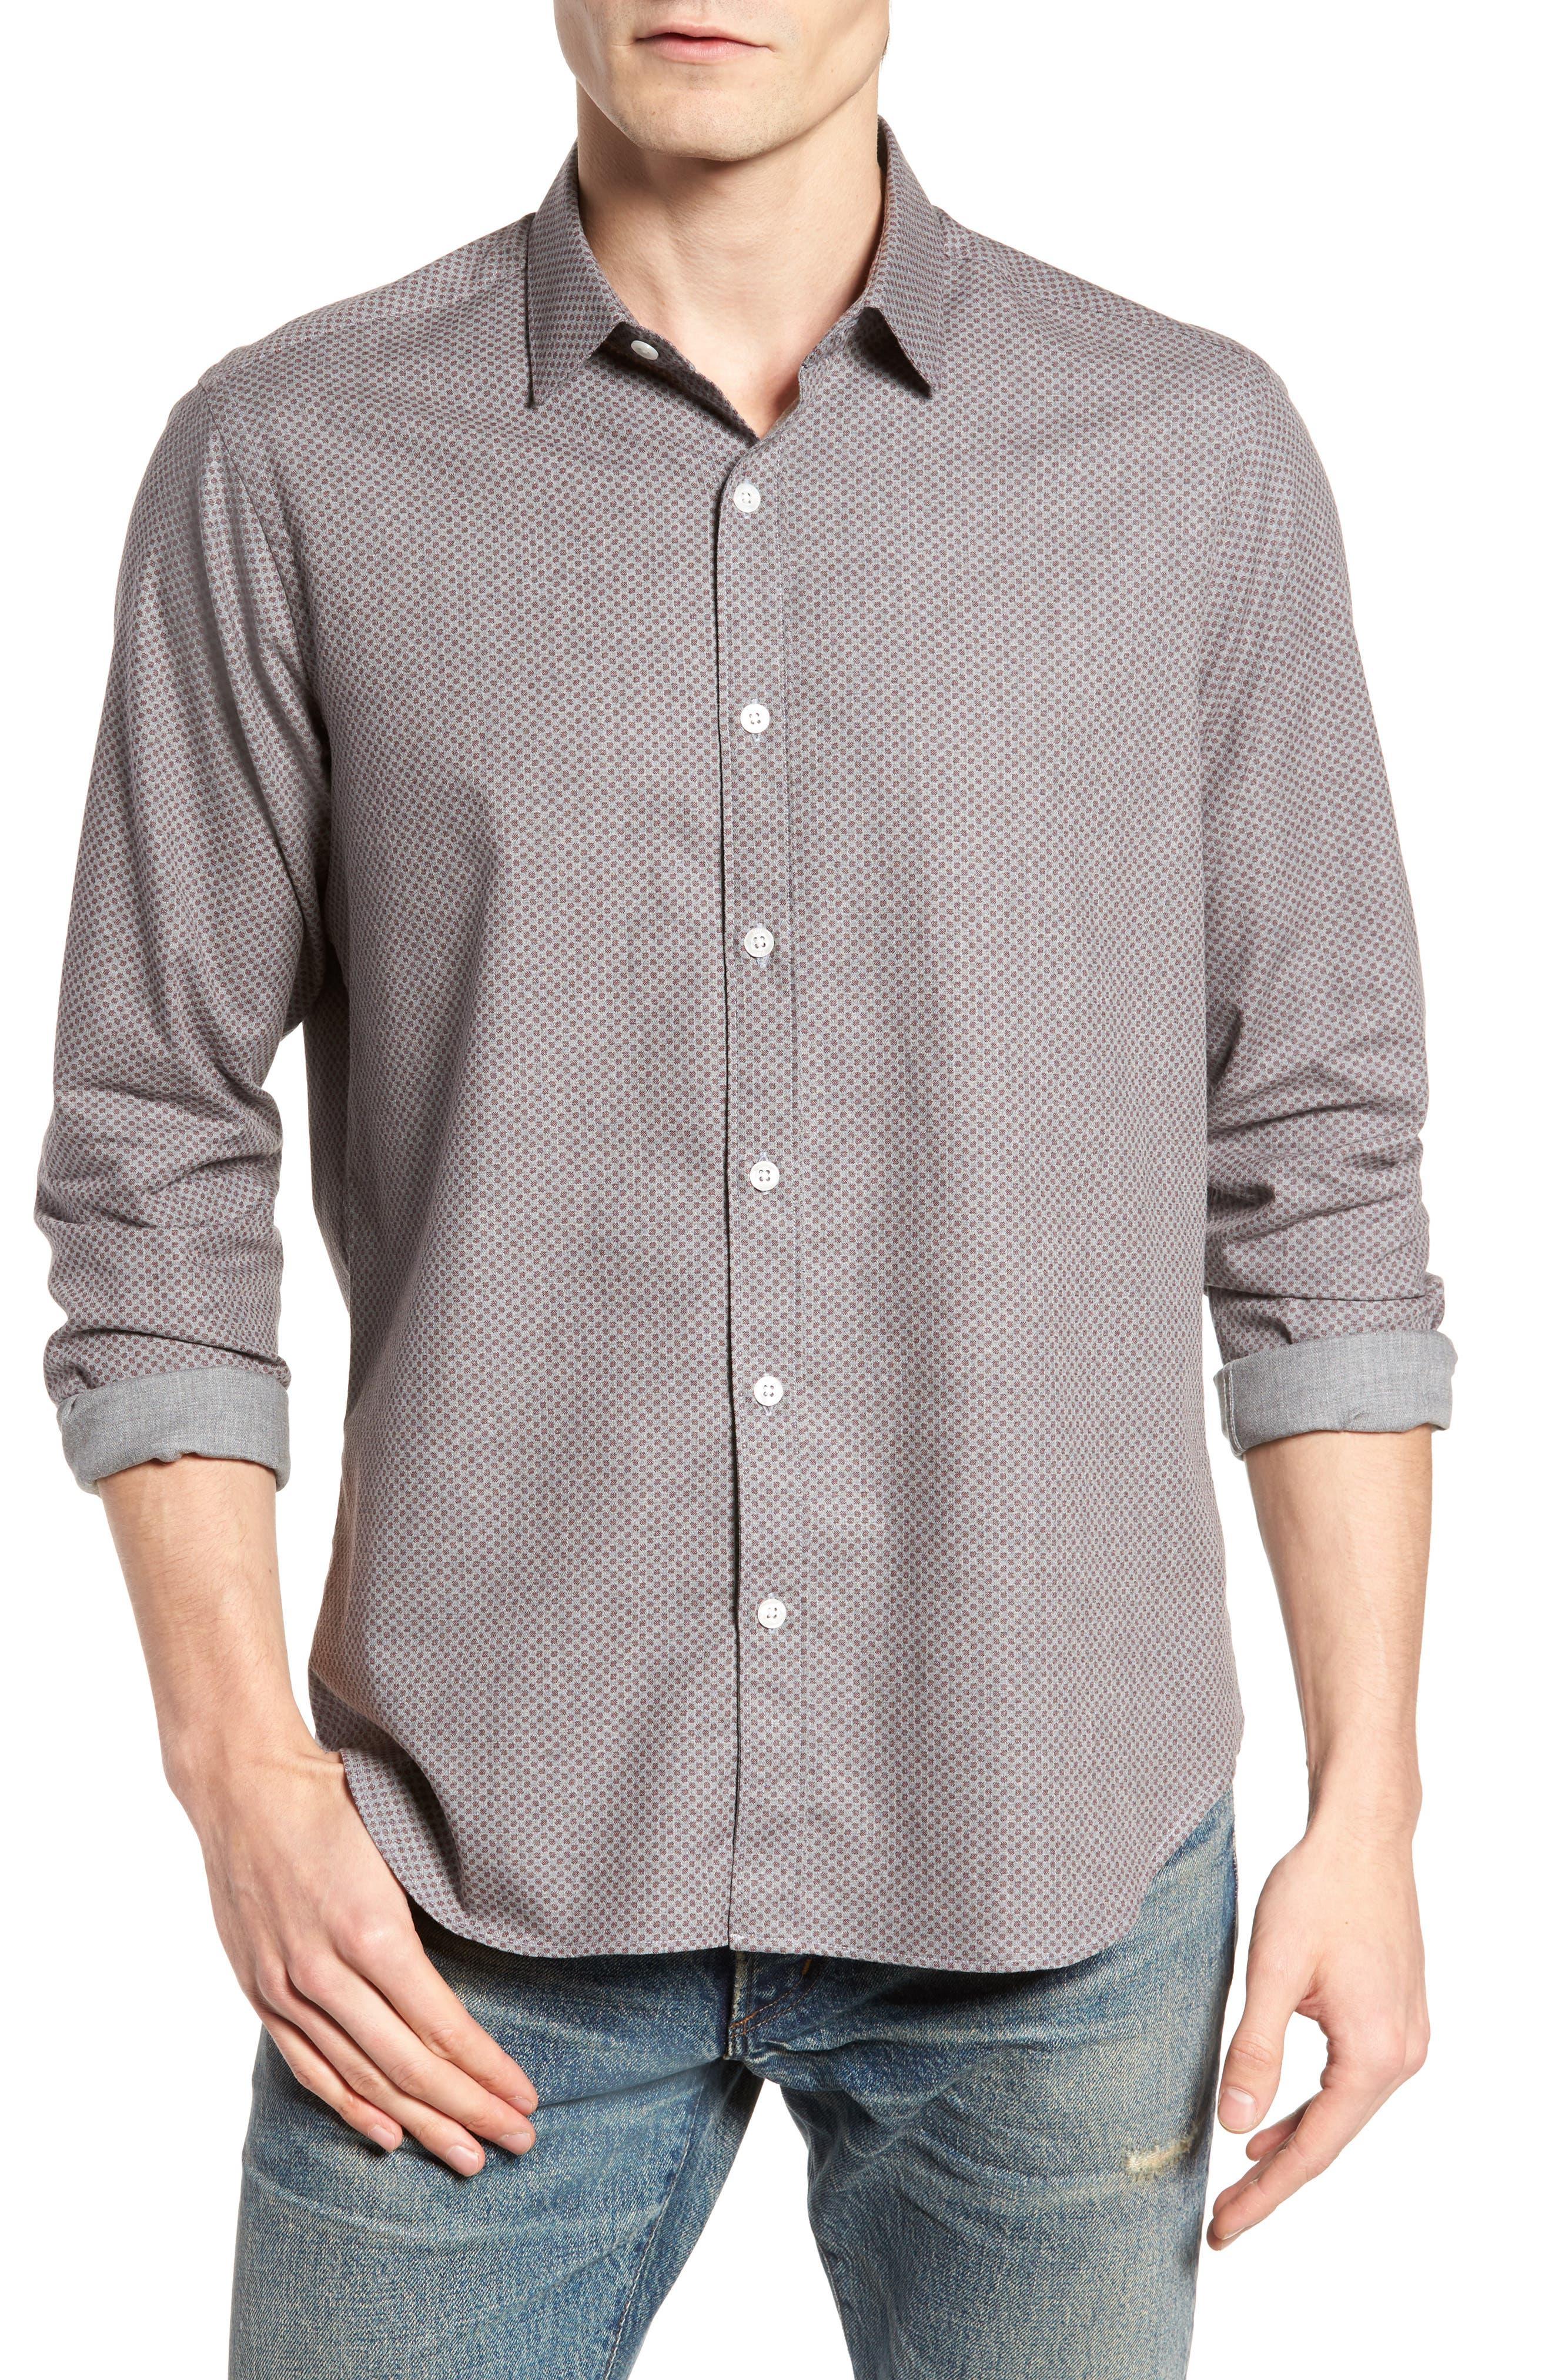 Main Image - Jeff Ludlow Slim Fit Flannel Sport Shirt